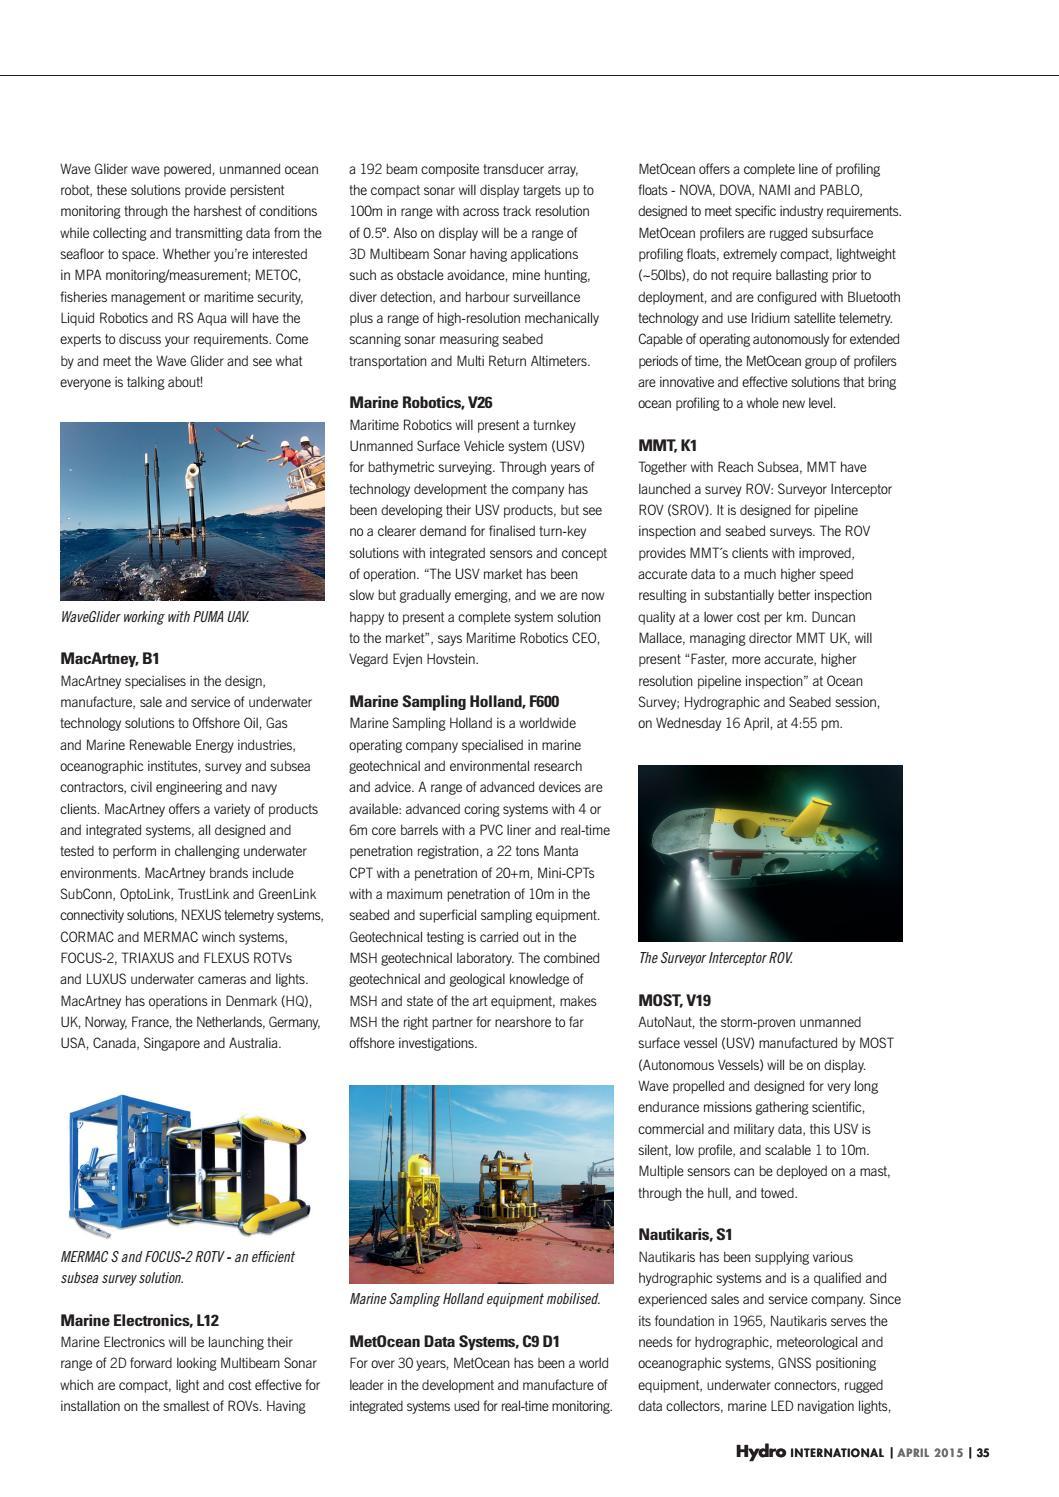 Hydro international april 2015 by Geomares Publishing - issuu